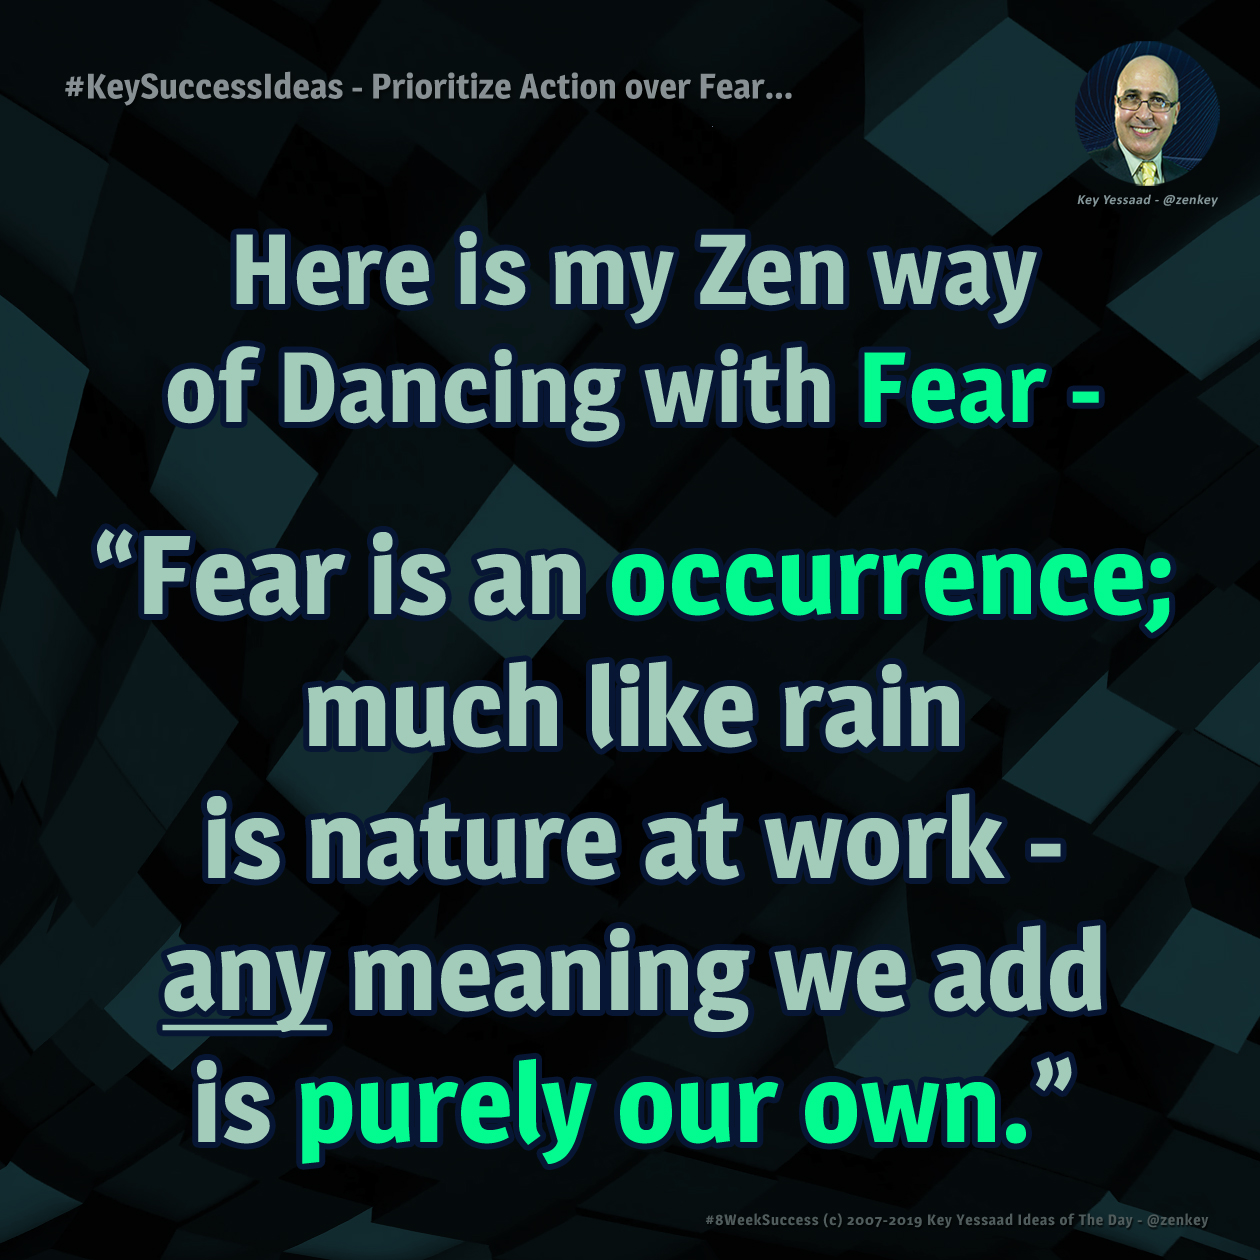 #KeySuccessIdeas - Prioritize Action over Fear...